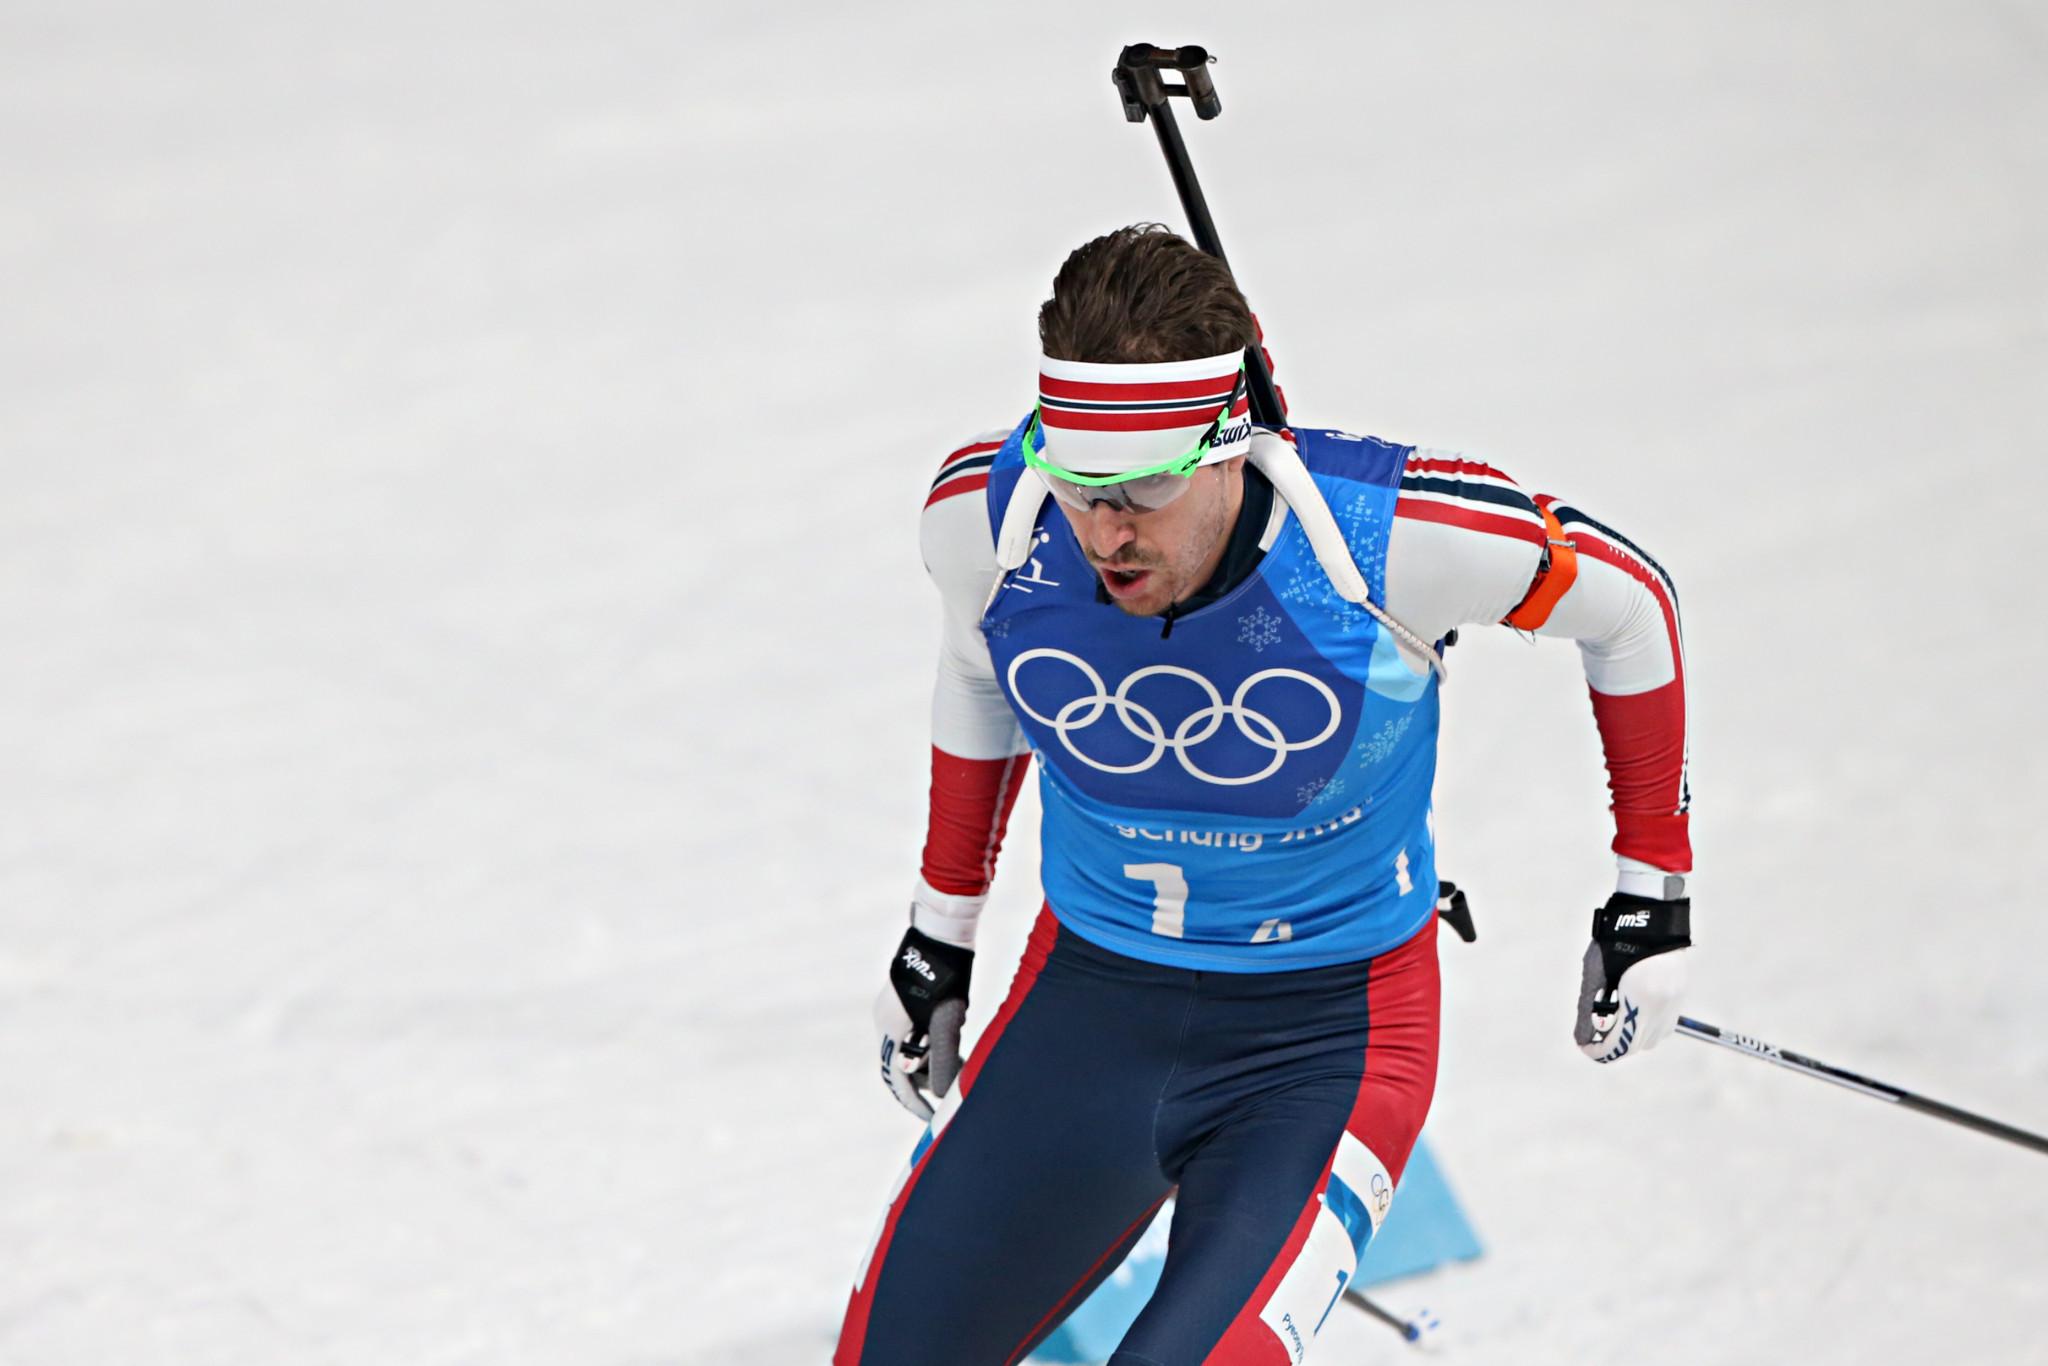 Four-time Olympic champion biathlete Svendsen retires